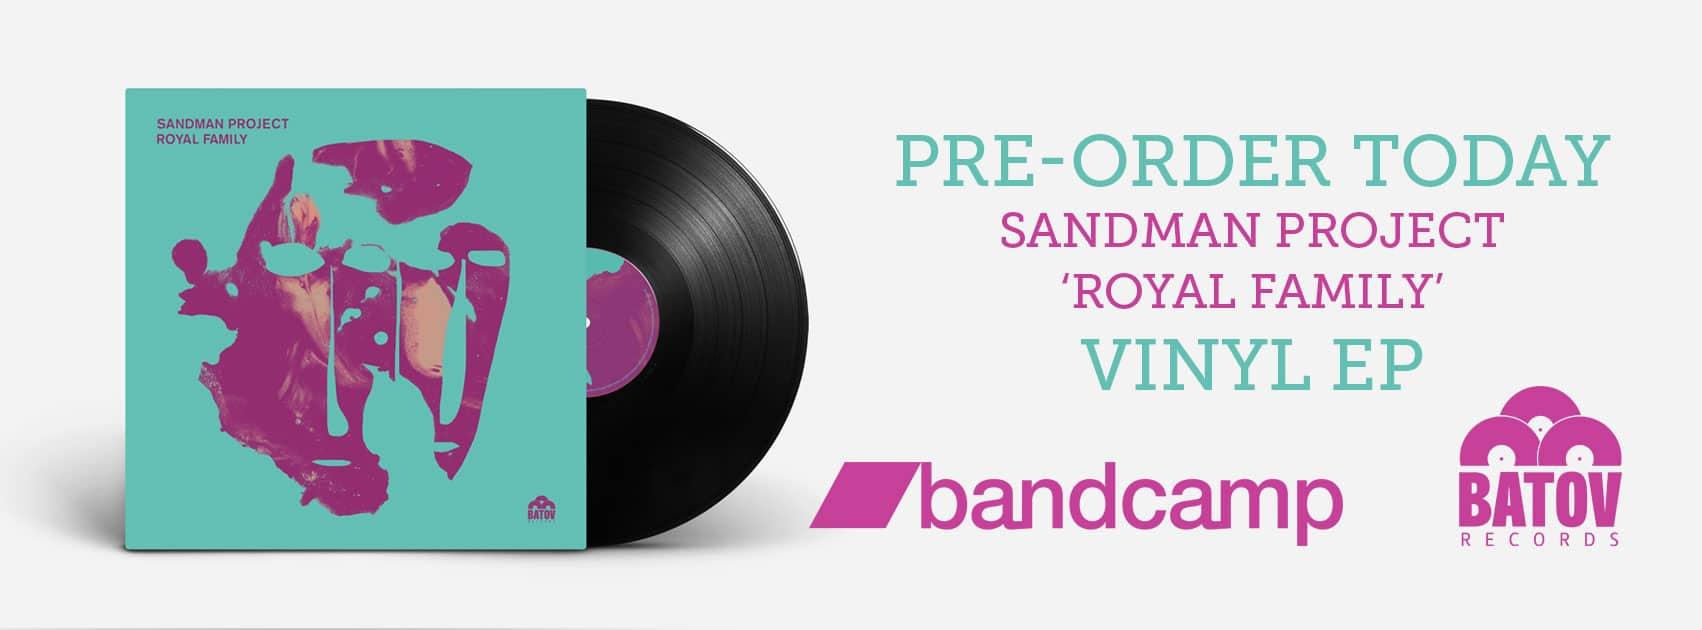 Sandman-Pre-order-vinyl